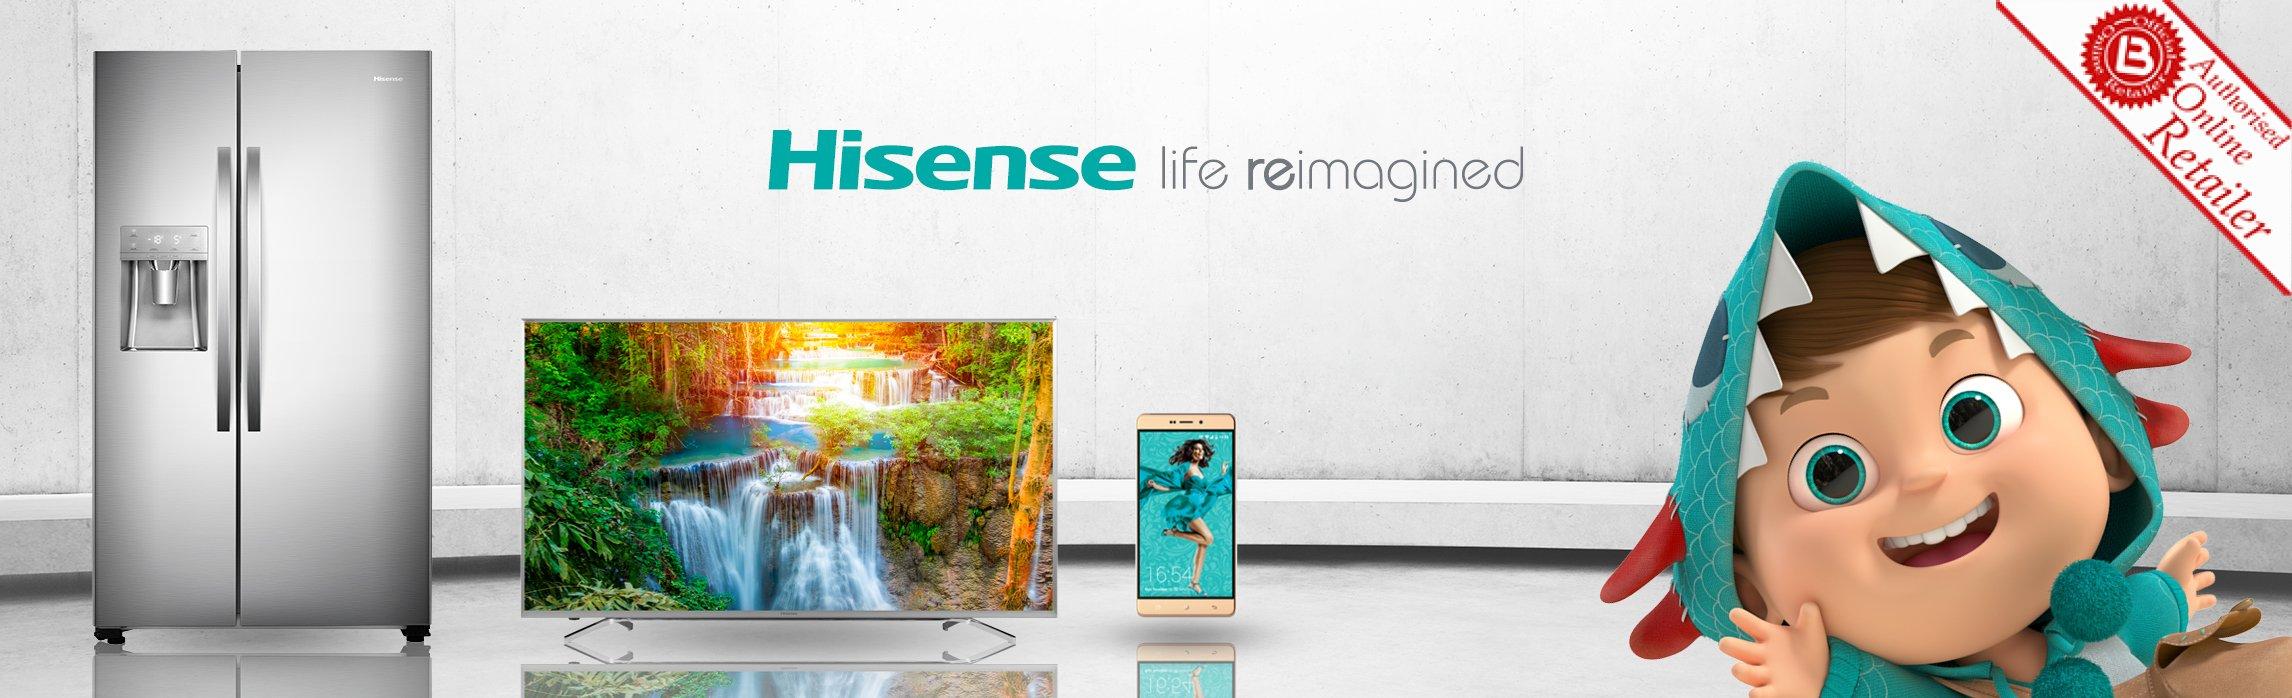 Hisense 536 l French Door Fridge/Freezer with Water Dispenser 5